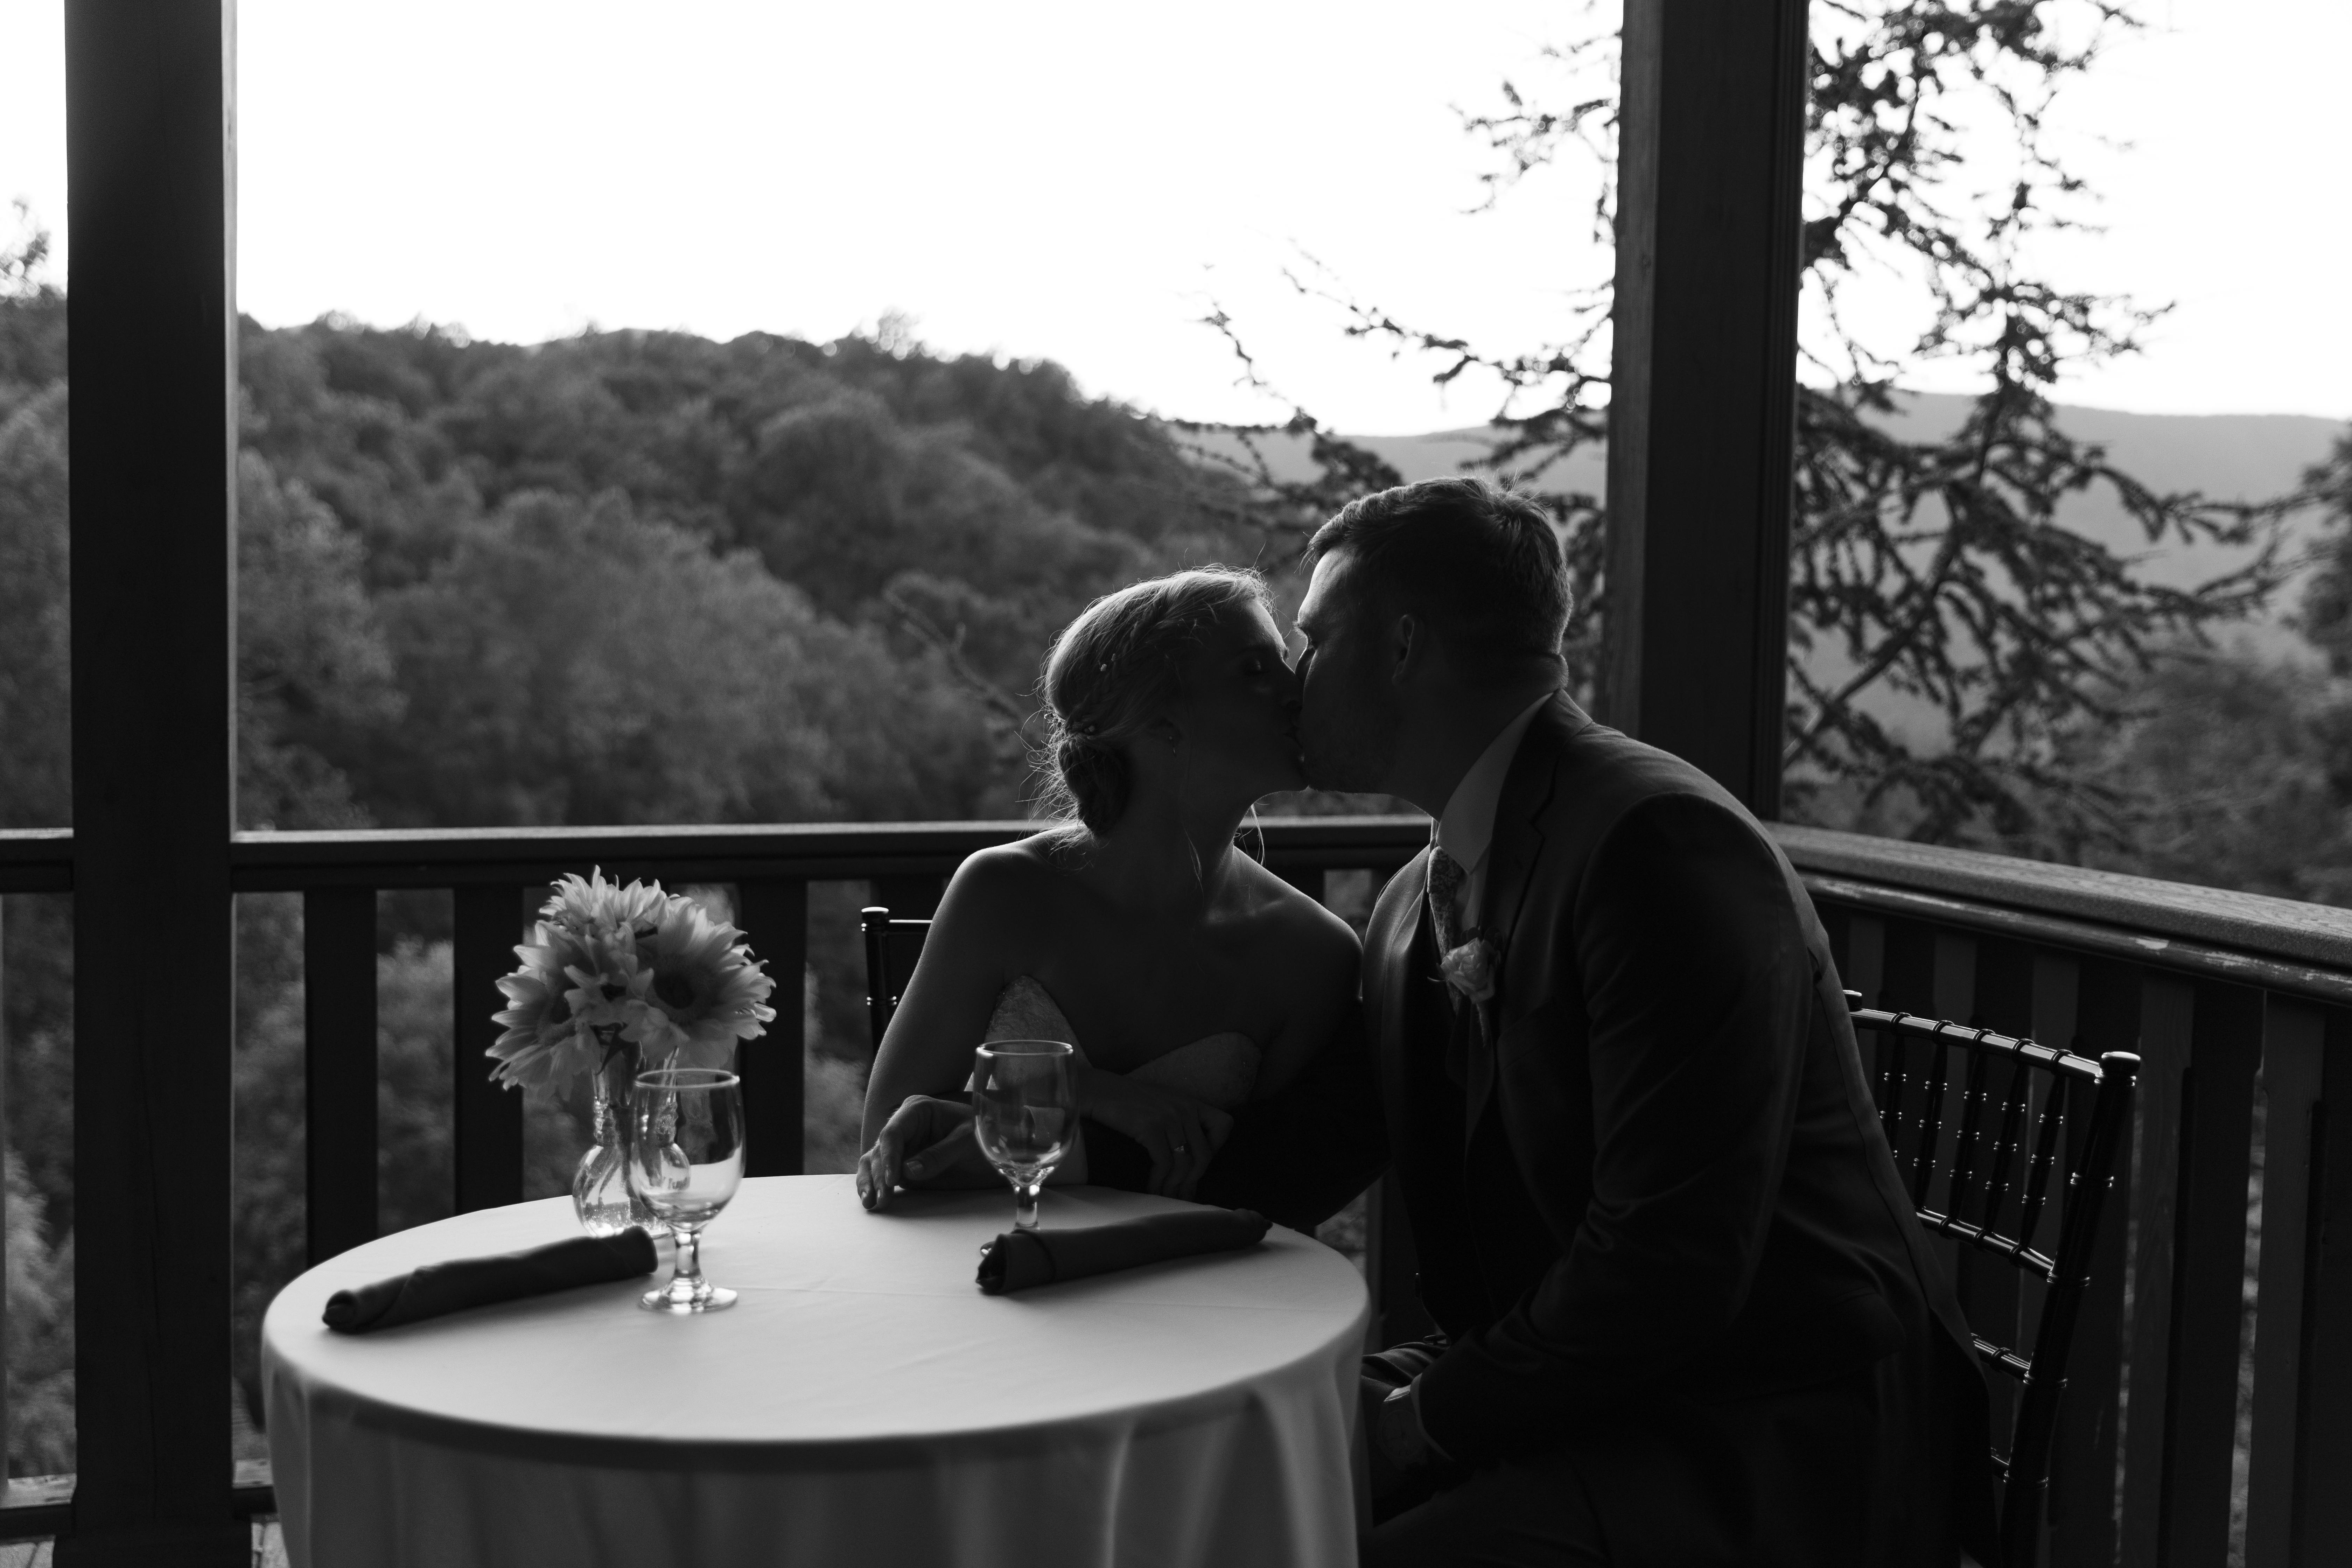 house mountain Inn wedding, wedding reception, bride and groom private dinner